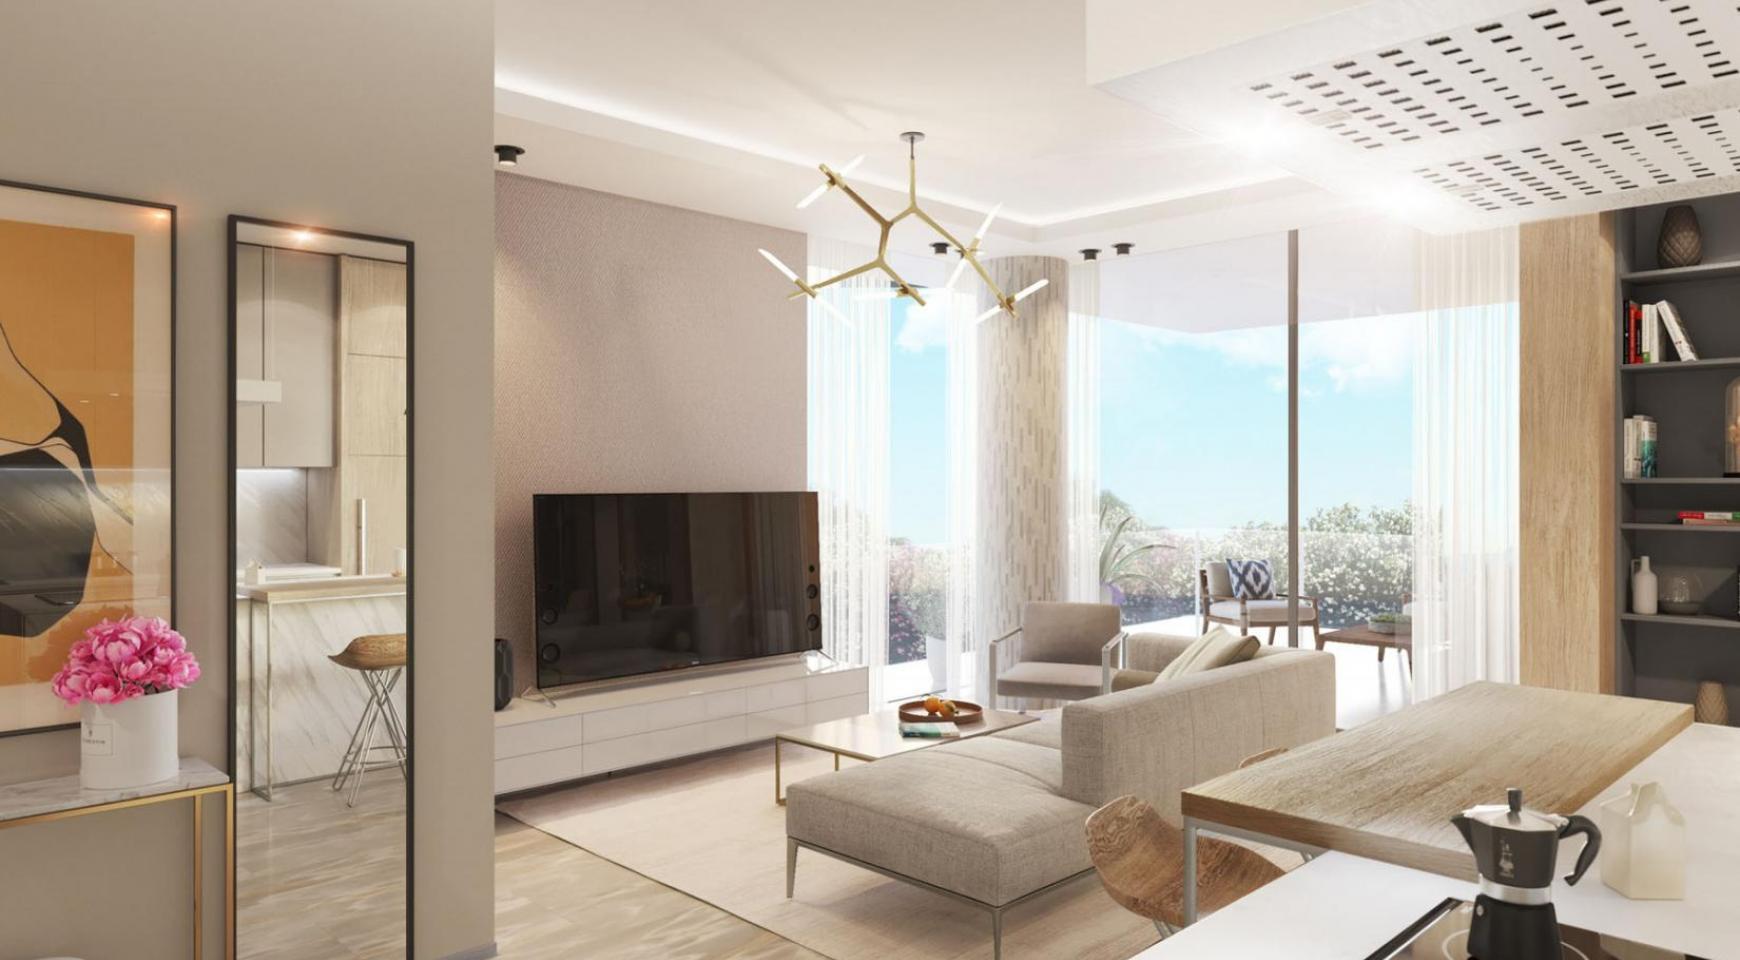 Contemporary 3 Bedroom Apartment in a New Complex near the Sea - 3